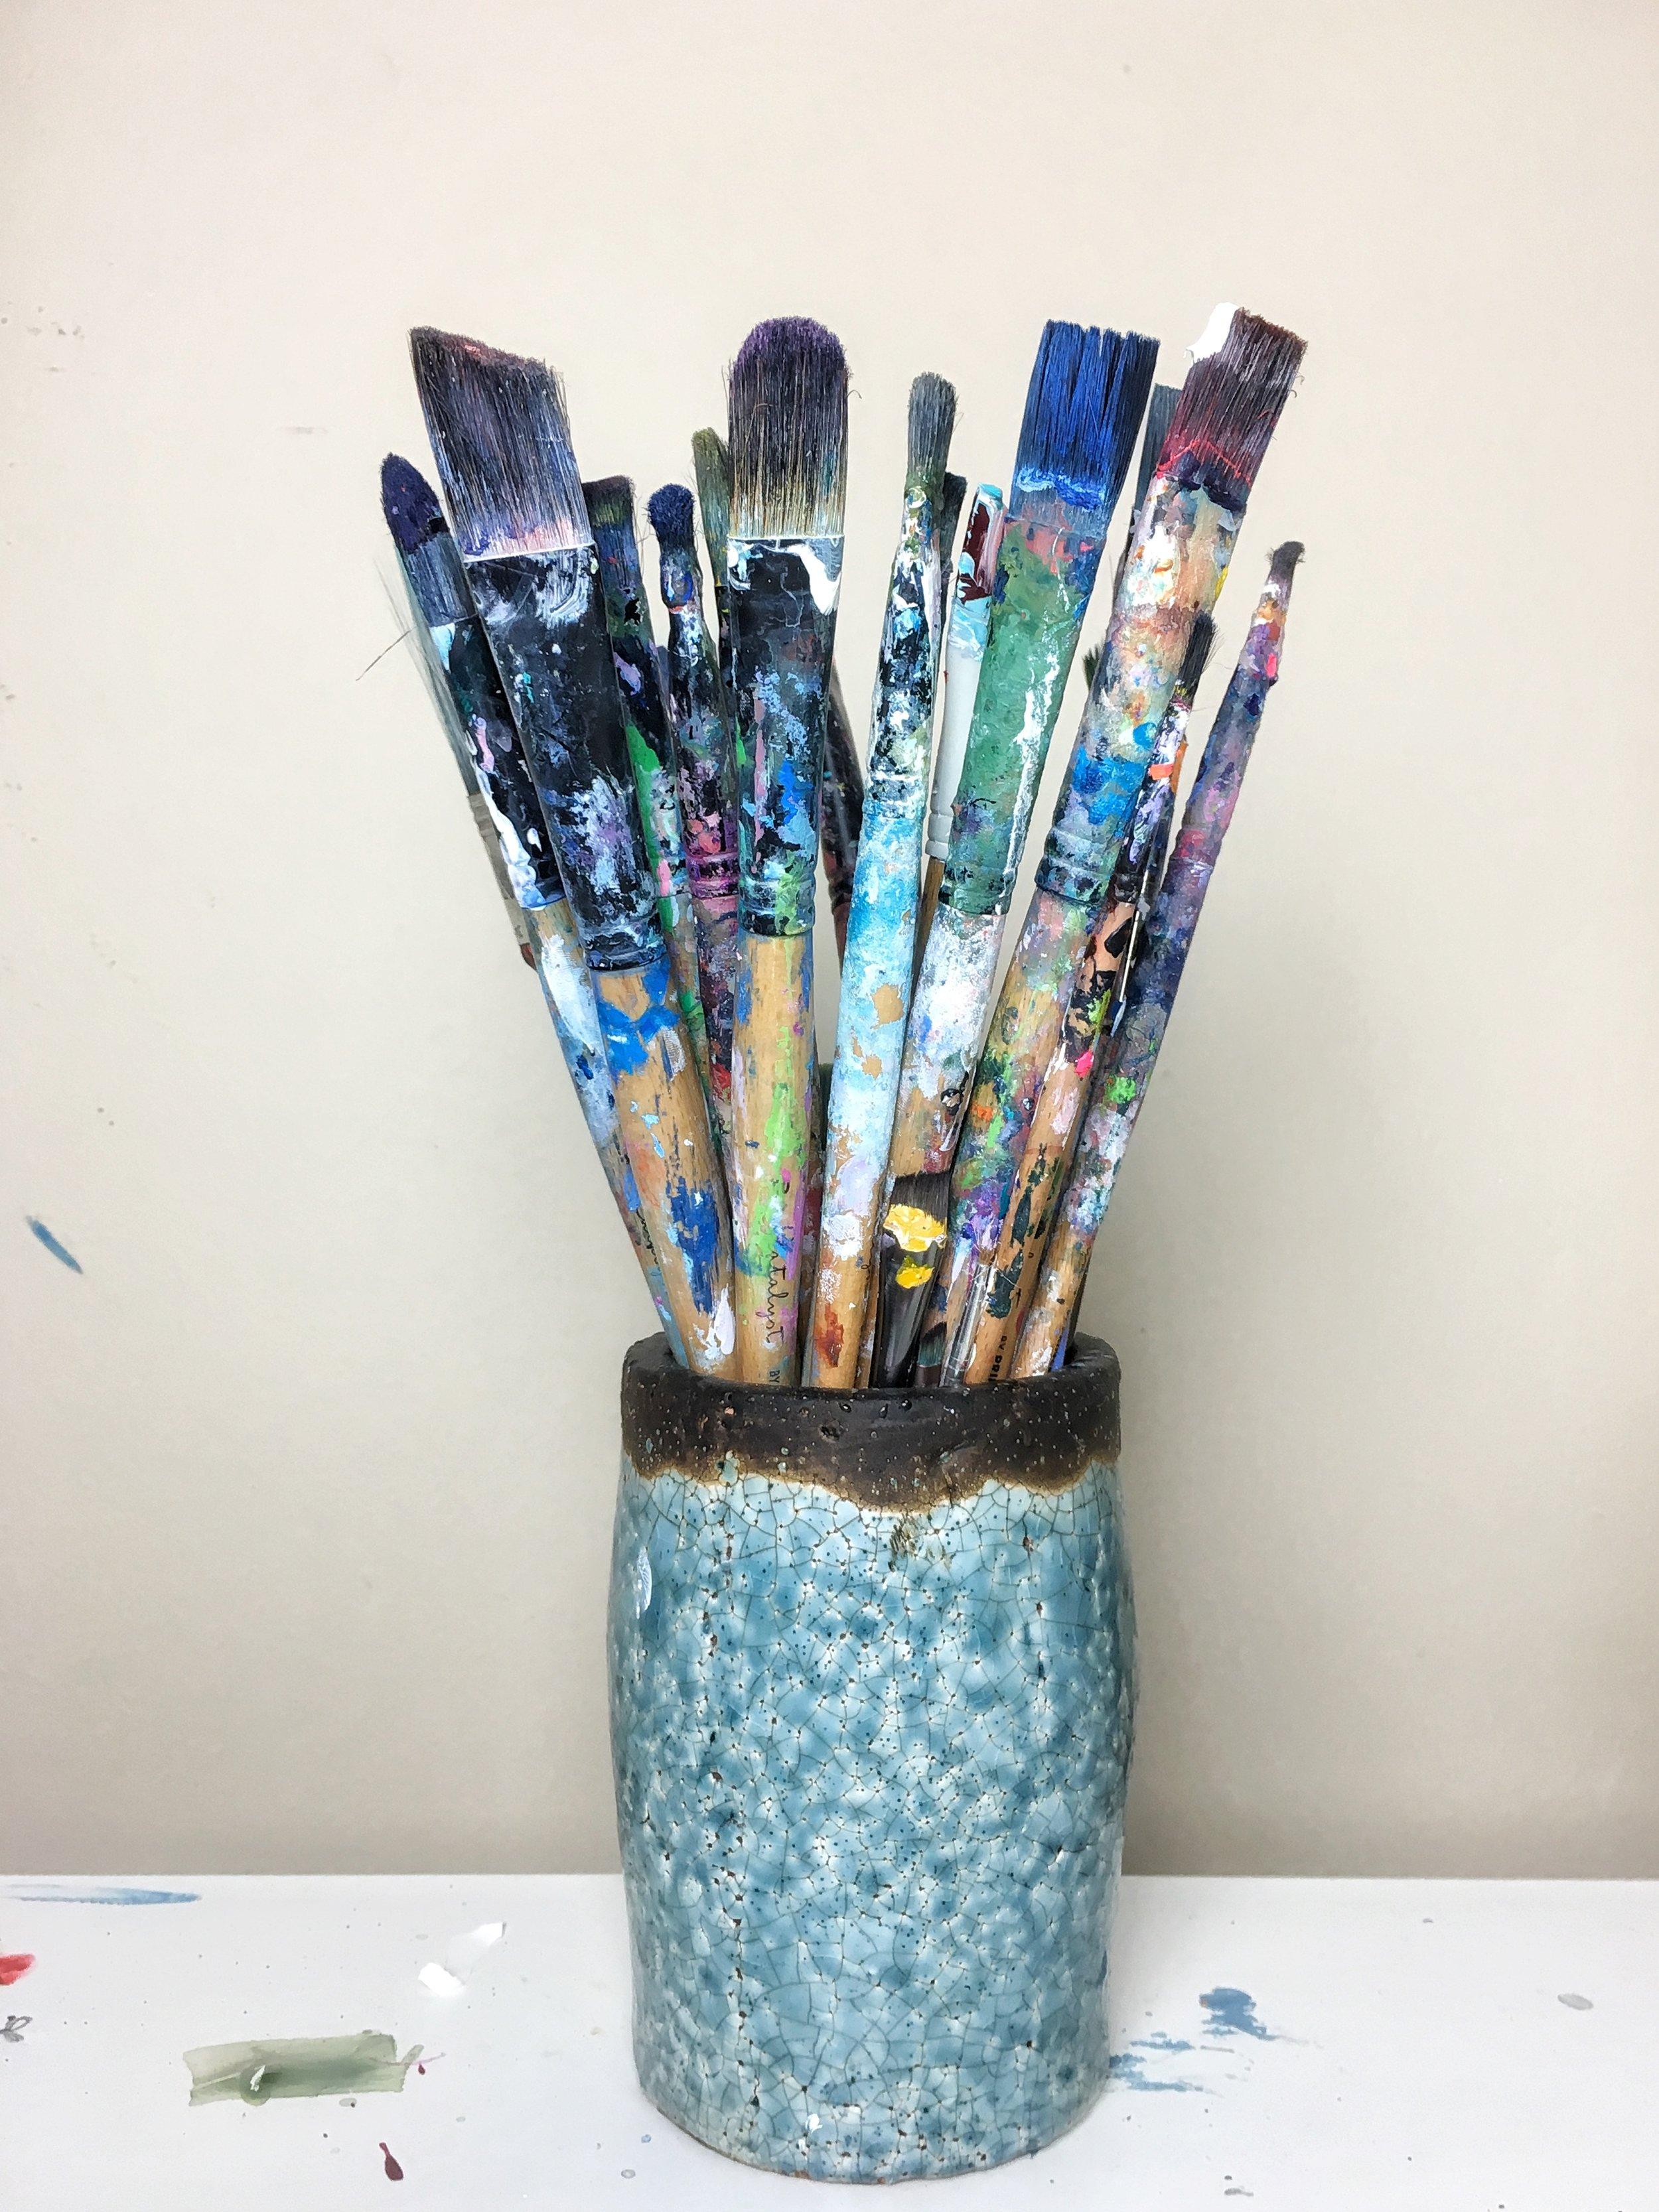 I keep my brushes in a pretty ceramic vase.